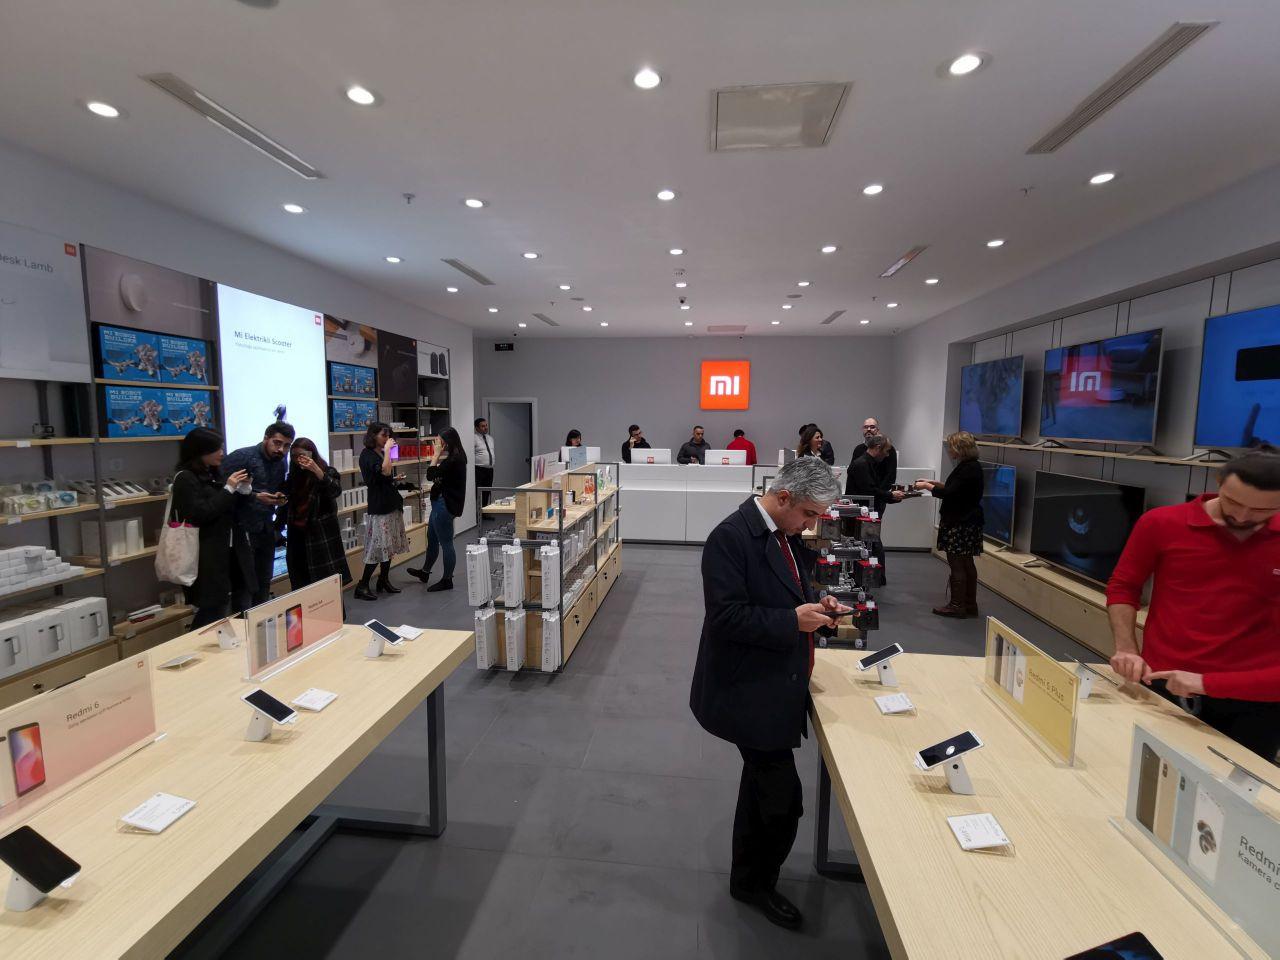 Xiaomi Forum İstanbul mağazasını gezdik! - Page 4